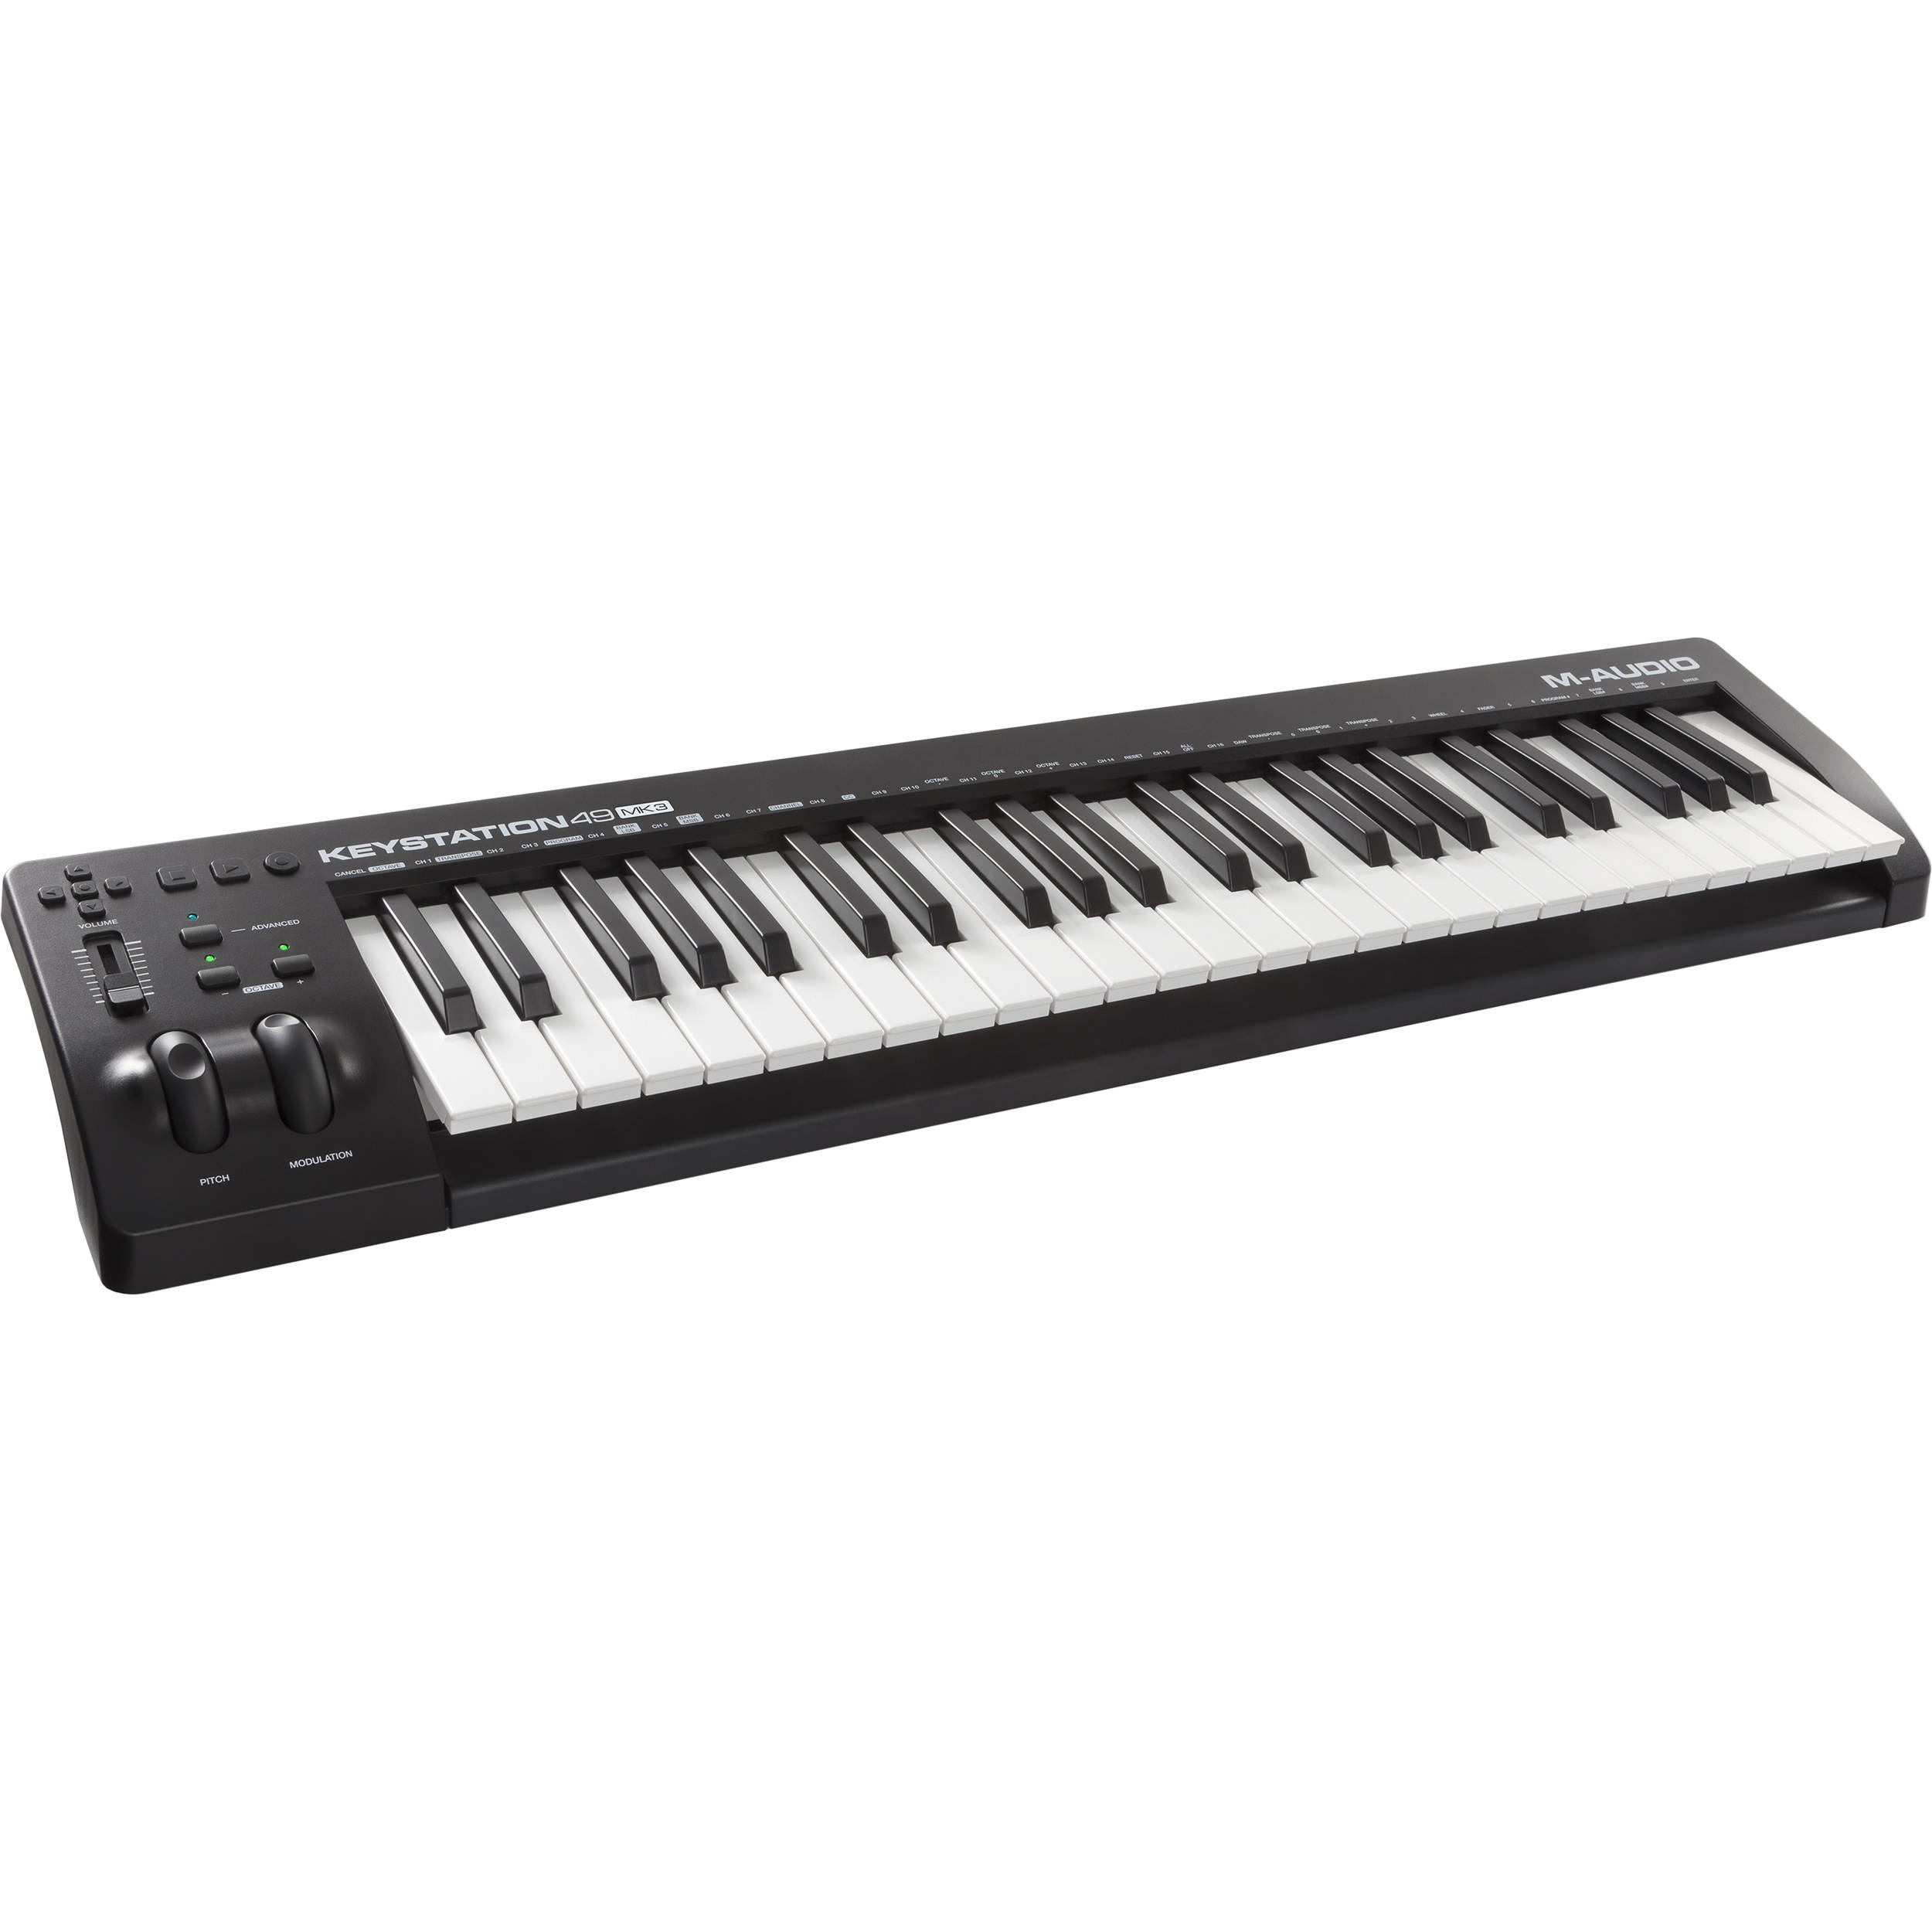 M-Audio Keystation 49 MK3 49-Key USB-Powered MIDI Controller